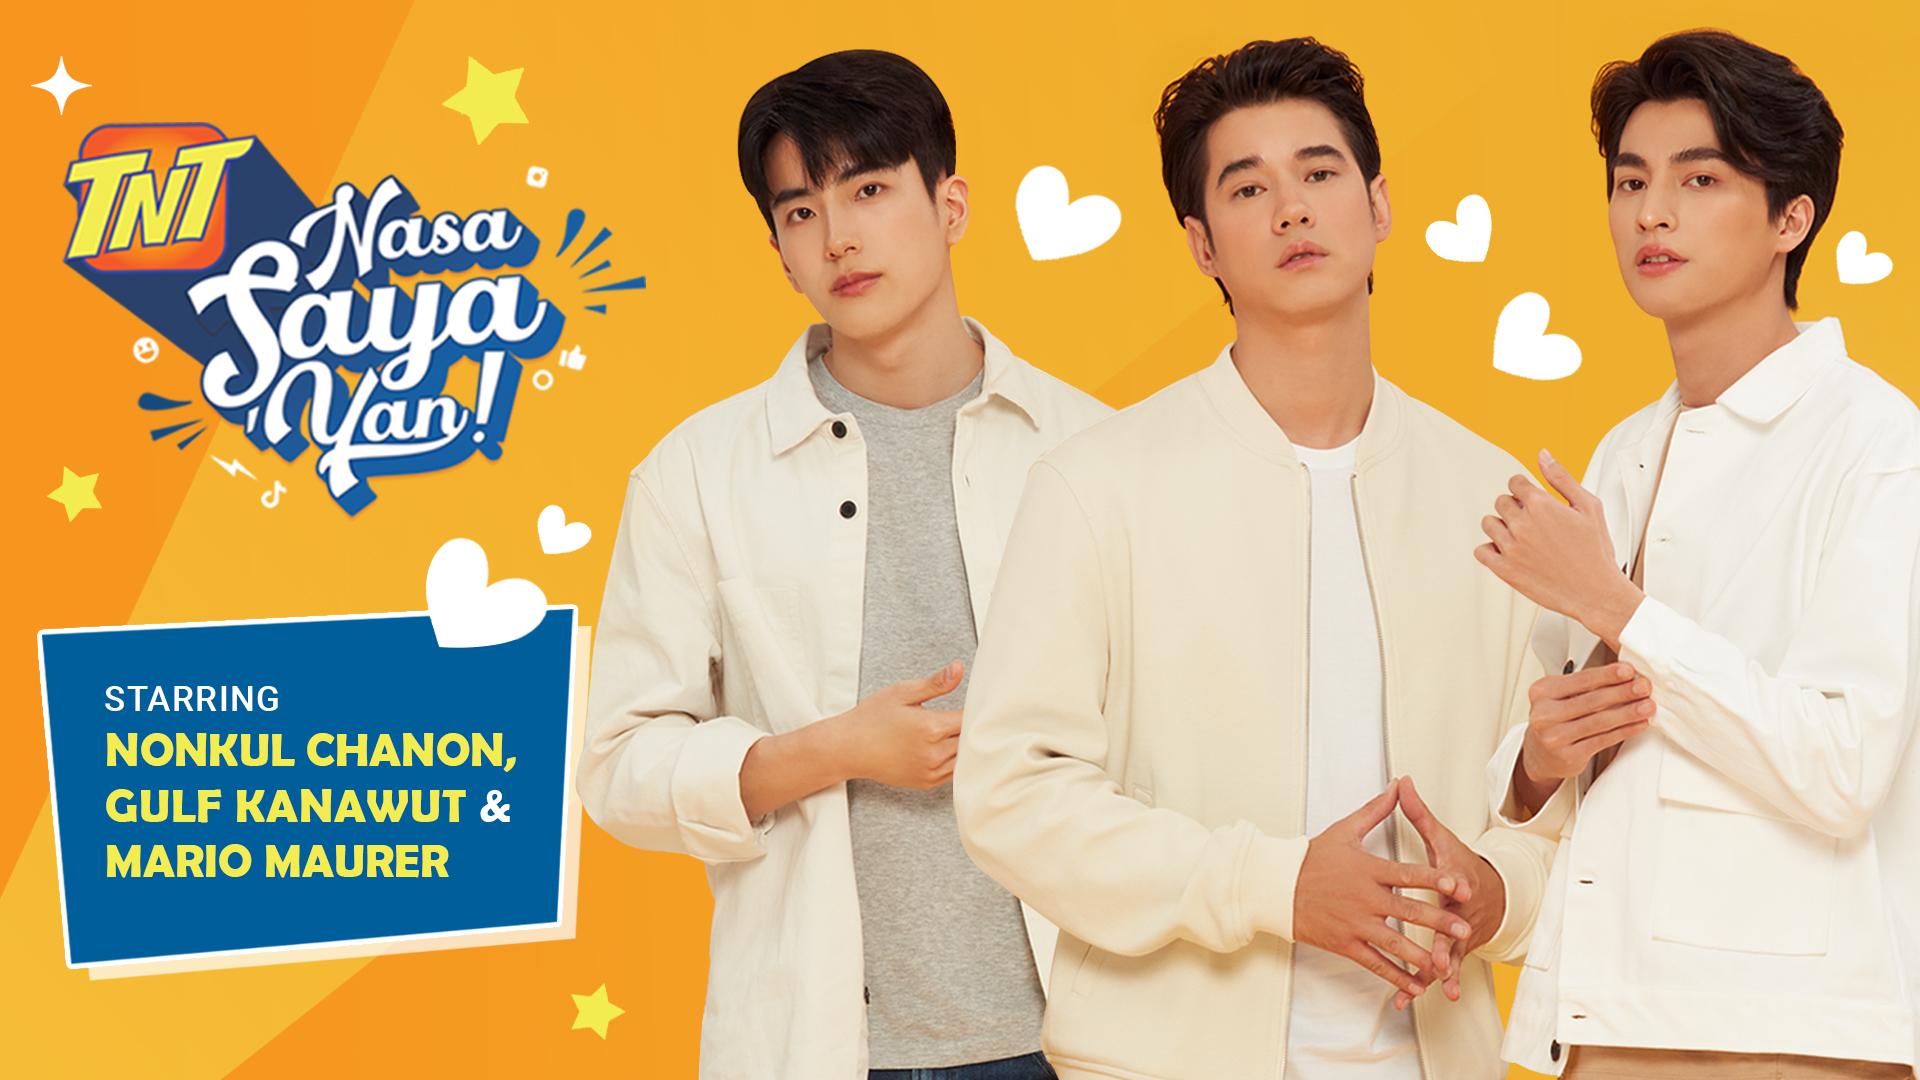 Thai Stars Mario Maurer, Gulf Kanawut, and Nonkul Chanon Join TNT in Their Biggest Campaign Yet